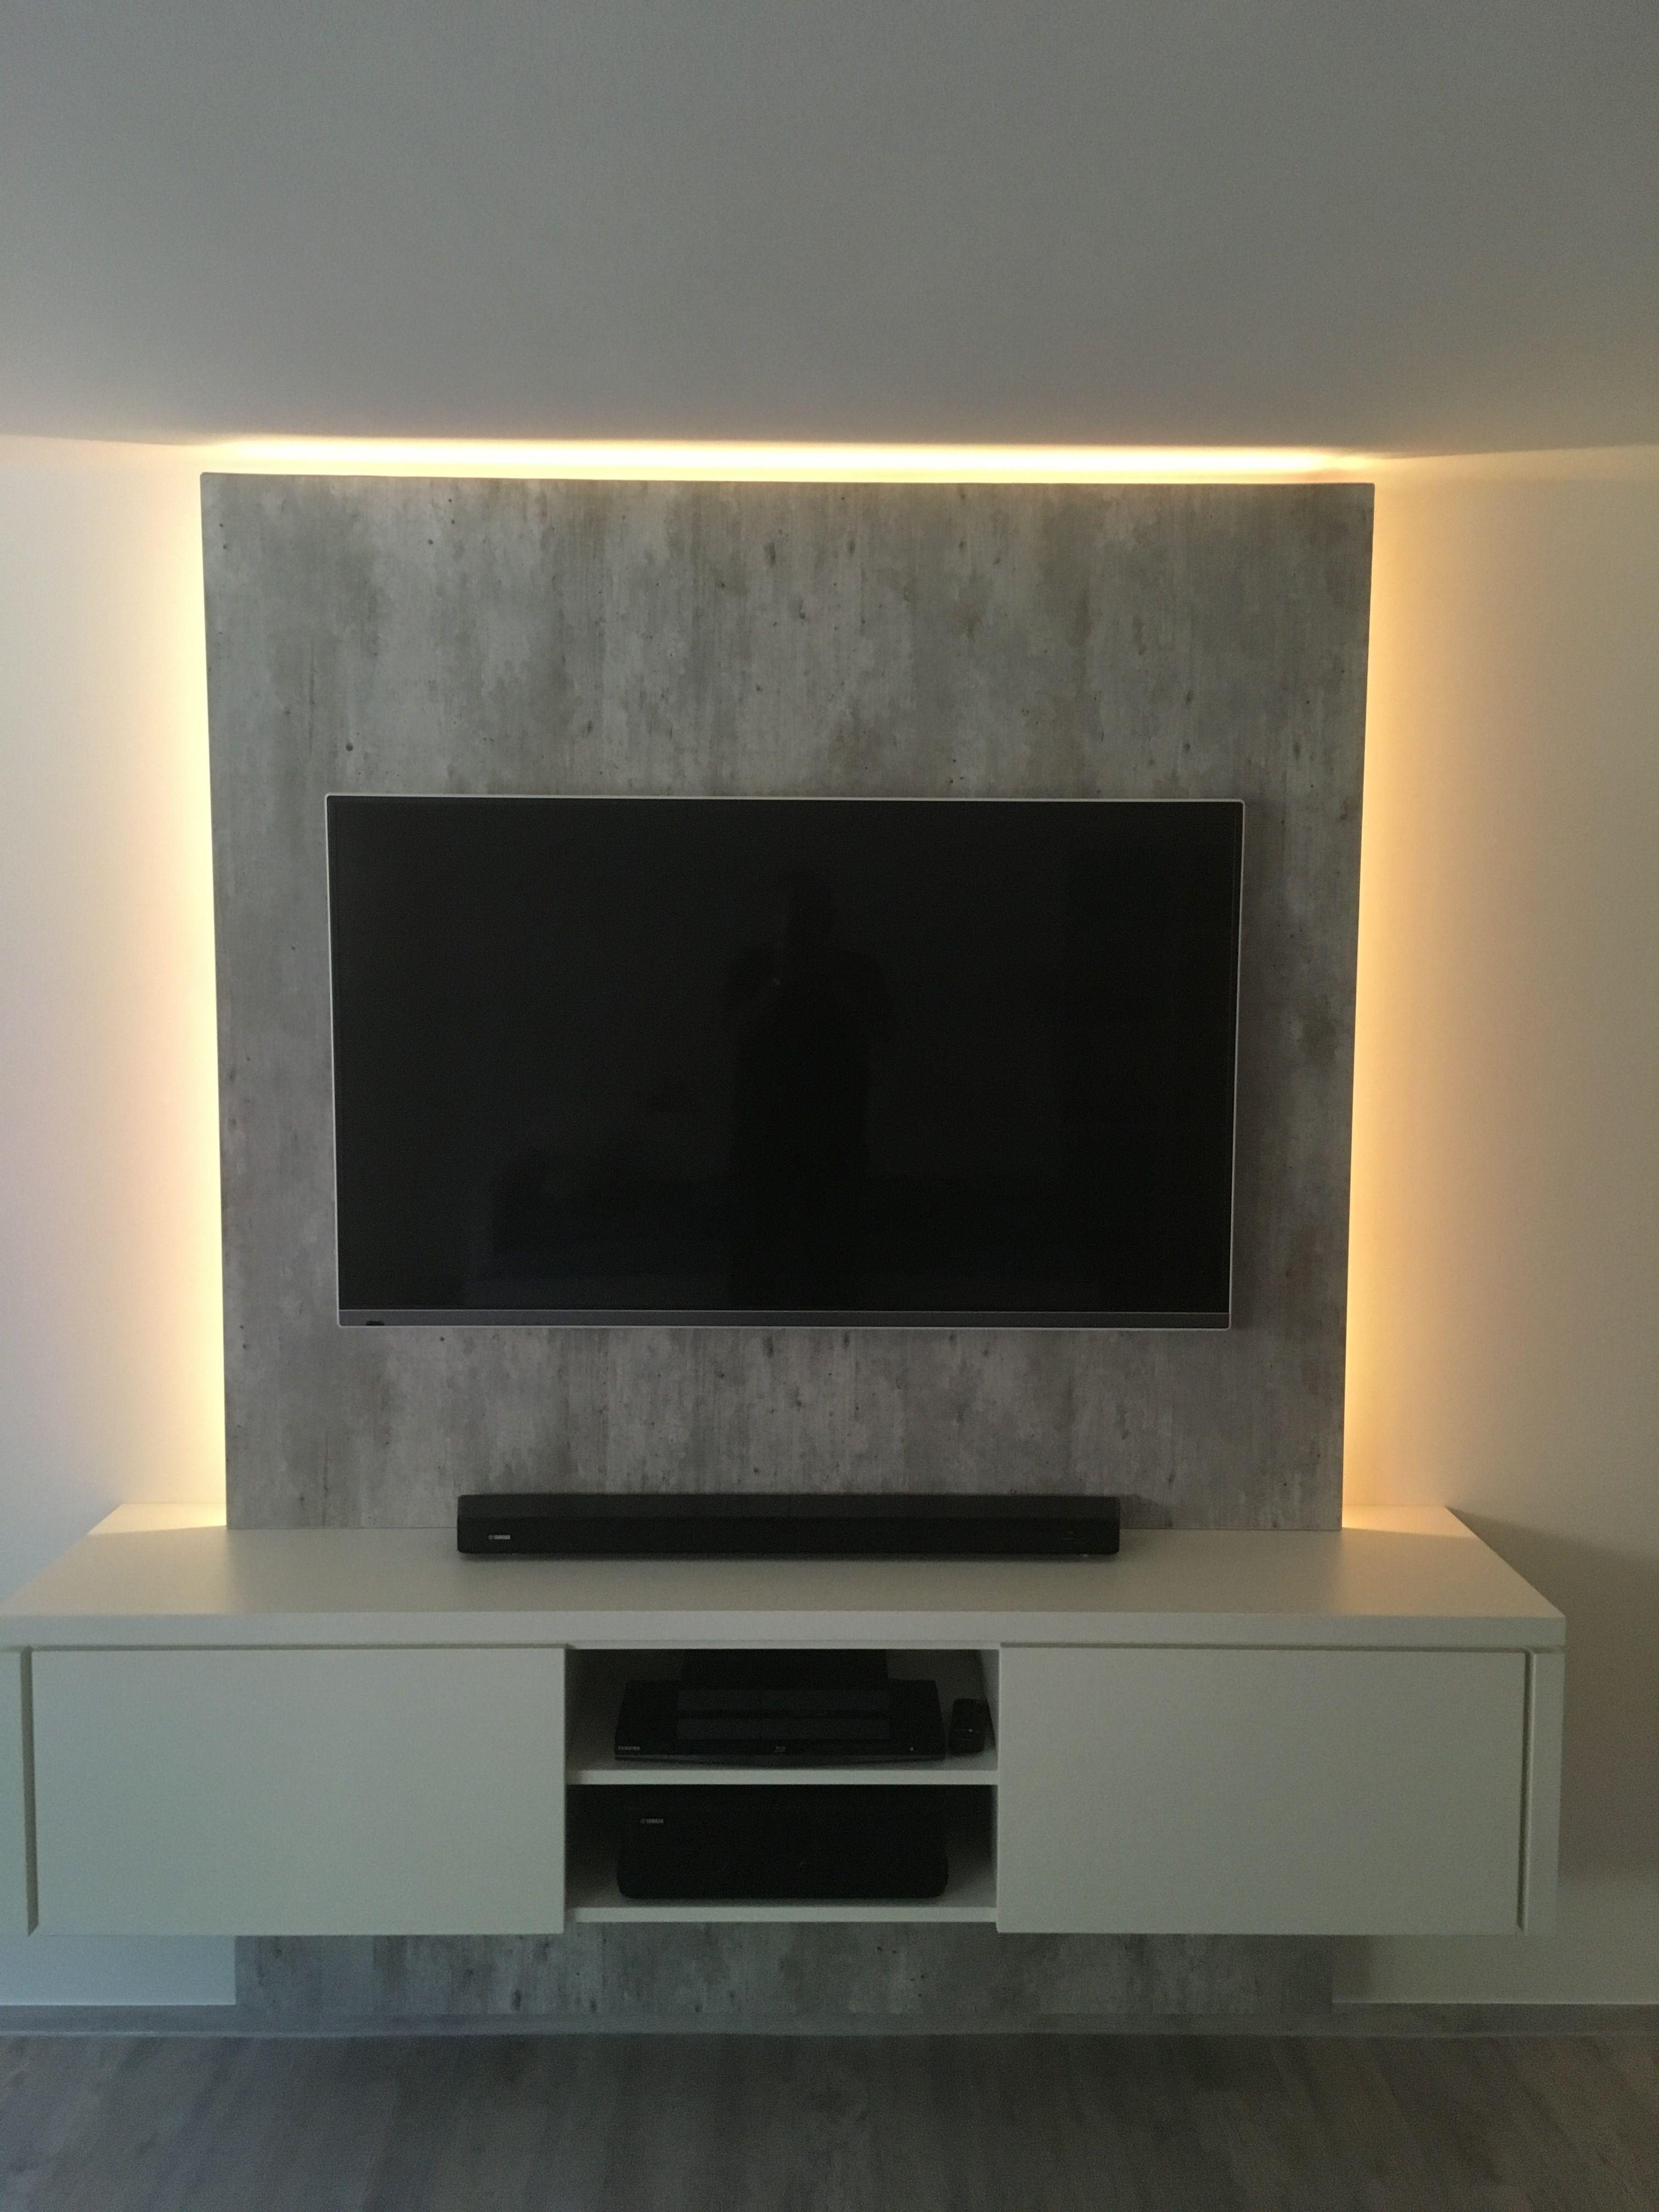 Tv Wand In Gelungener Kombination Angesagte Betonoptik Und Vanille Matt Betonoptik Tv Wand Wohnzimmer Tv Wand